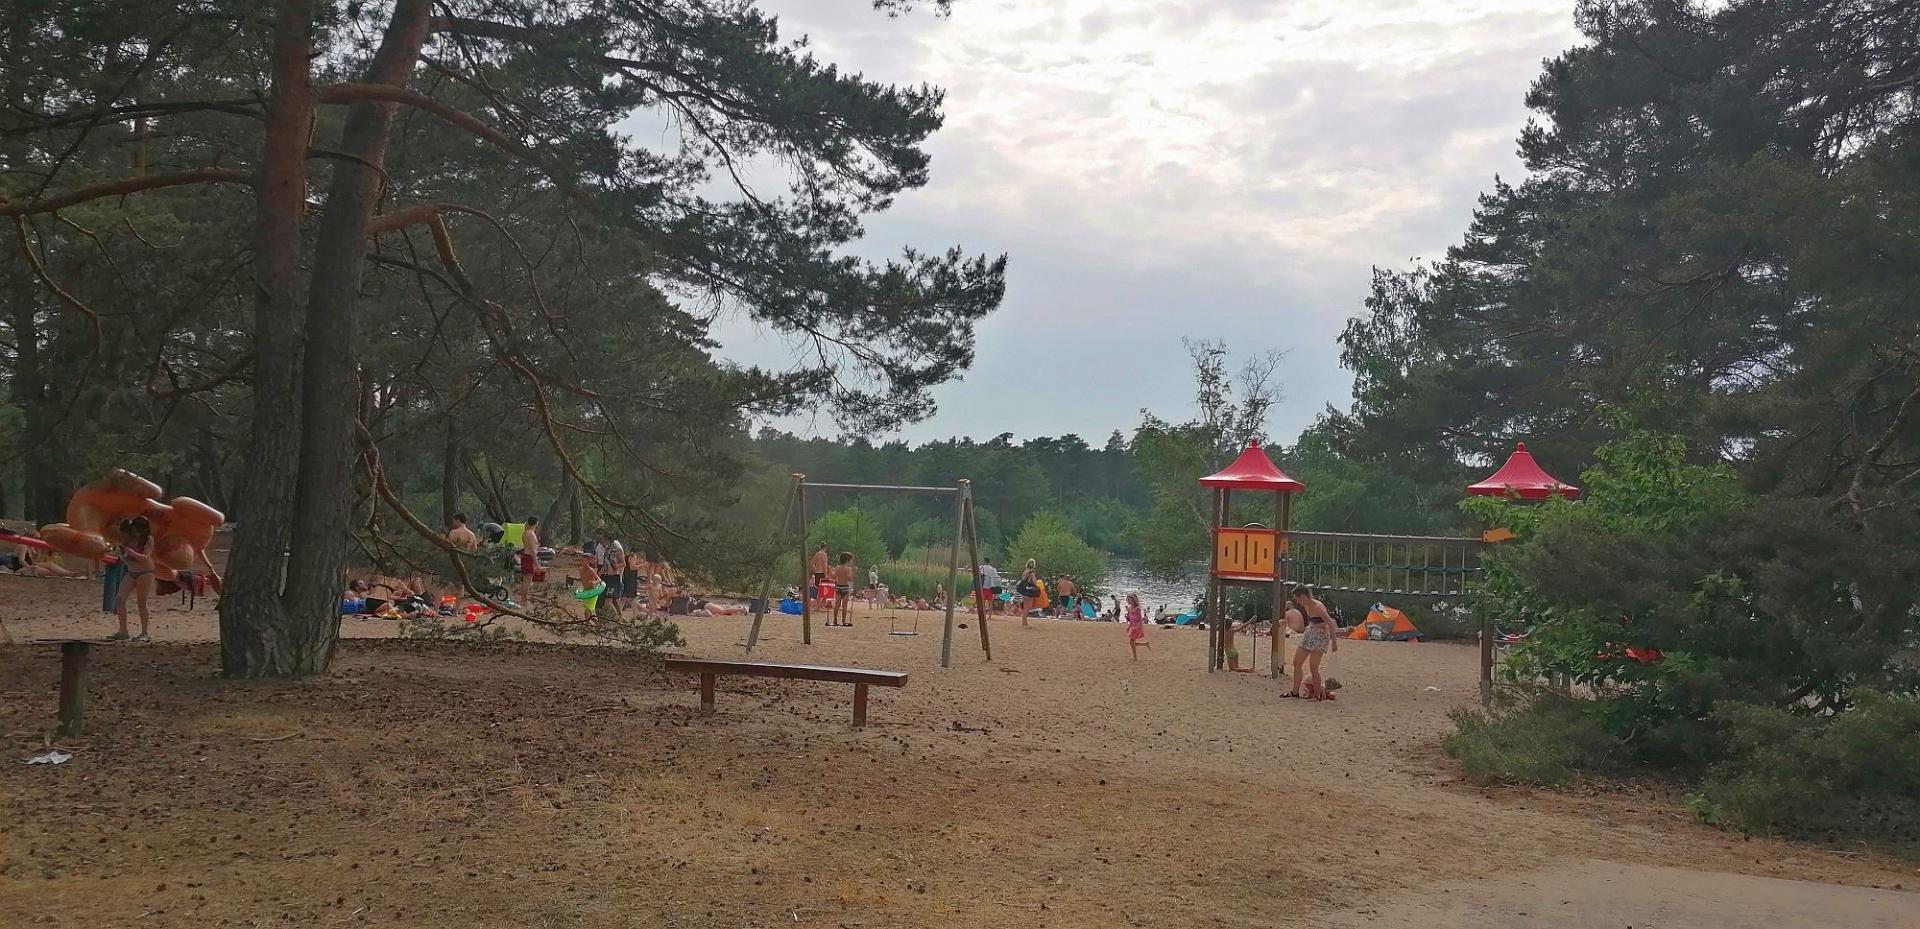 Am Klein Köriser Tonsee suchen an heißen Tagen hunderte Gäste Erfrischung. Foto: Dörthe Ziemer